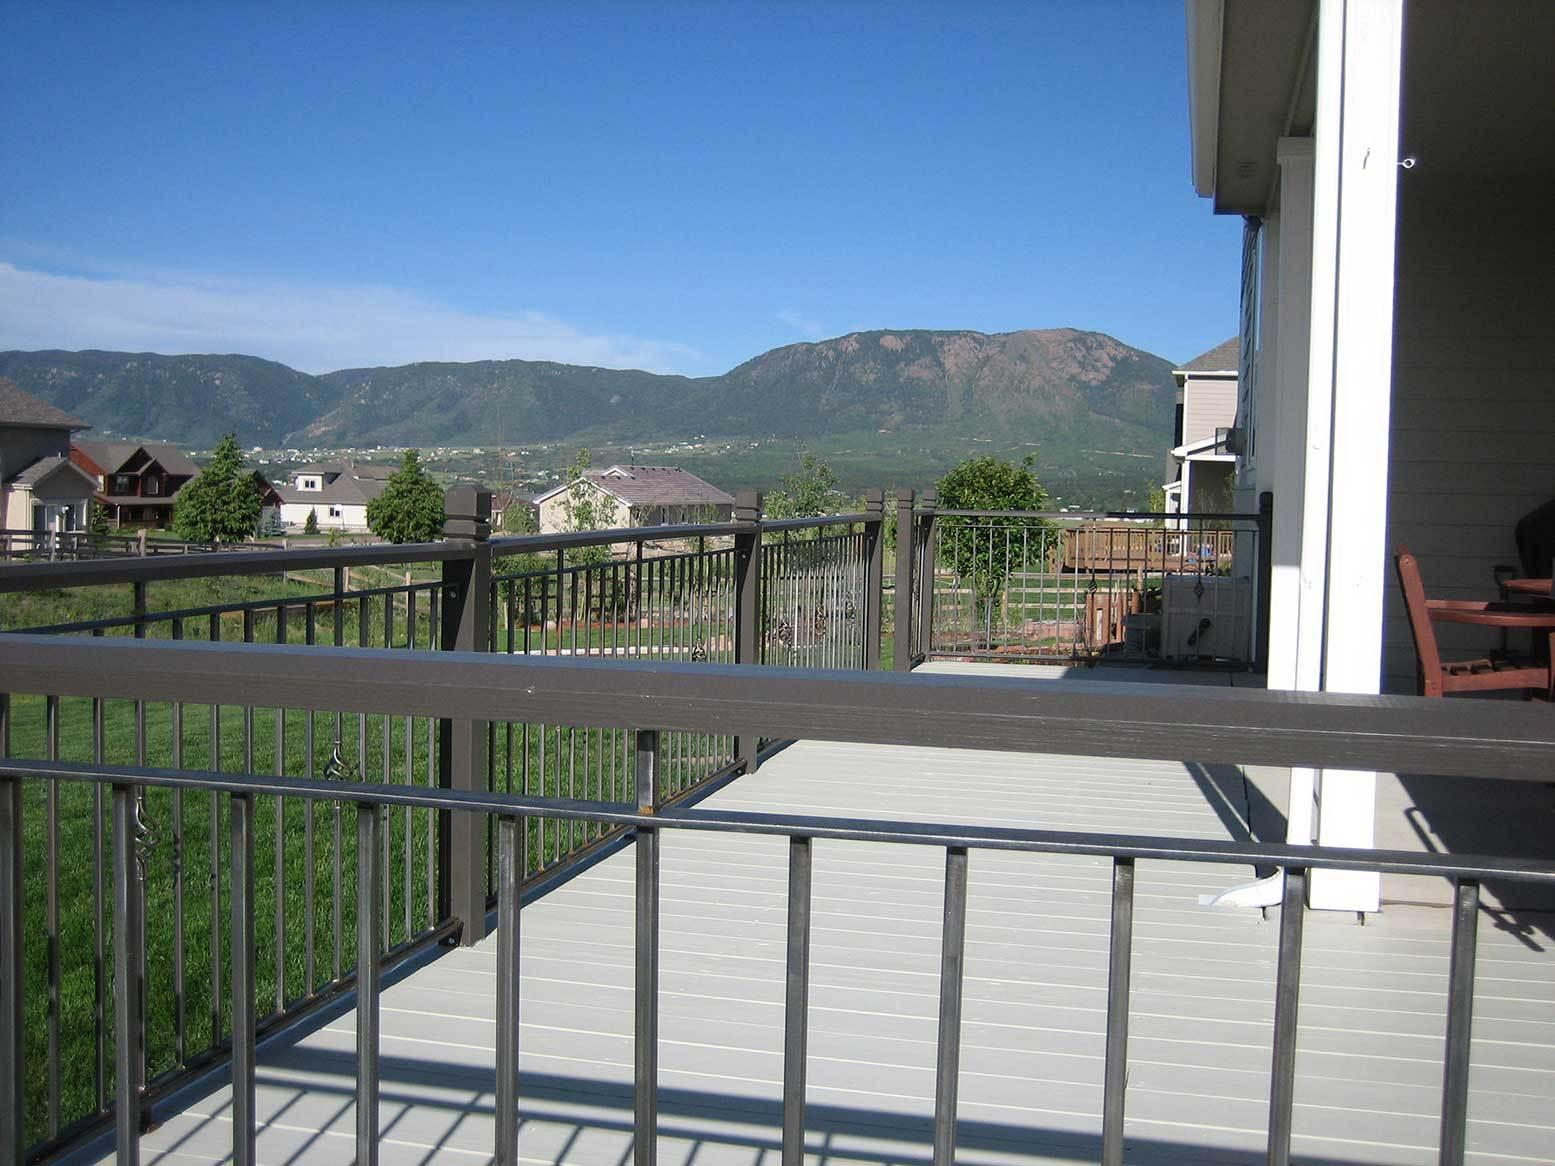 Handrail by PTR Welding & Fabrication, Denver, Colorado